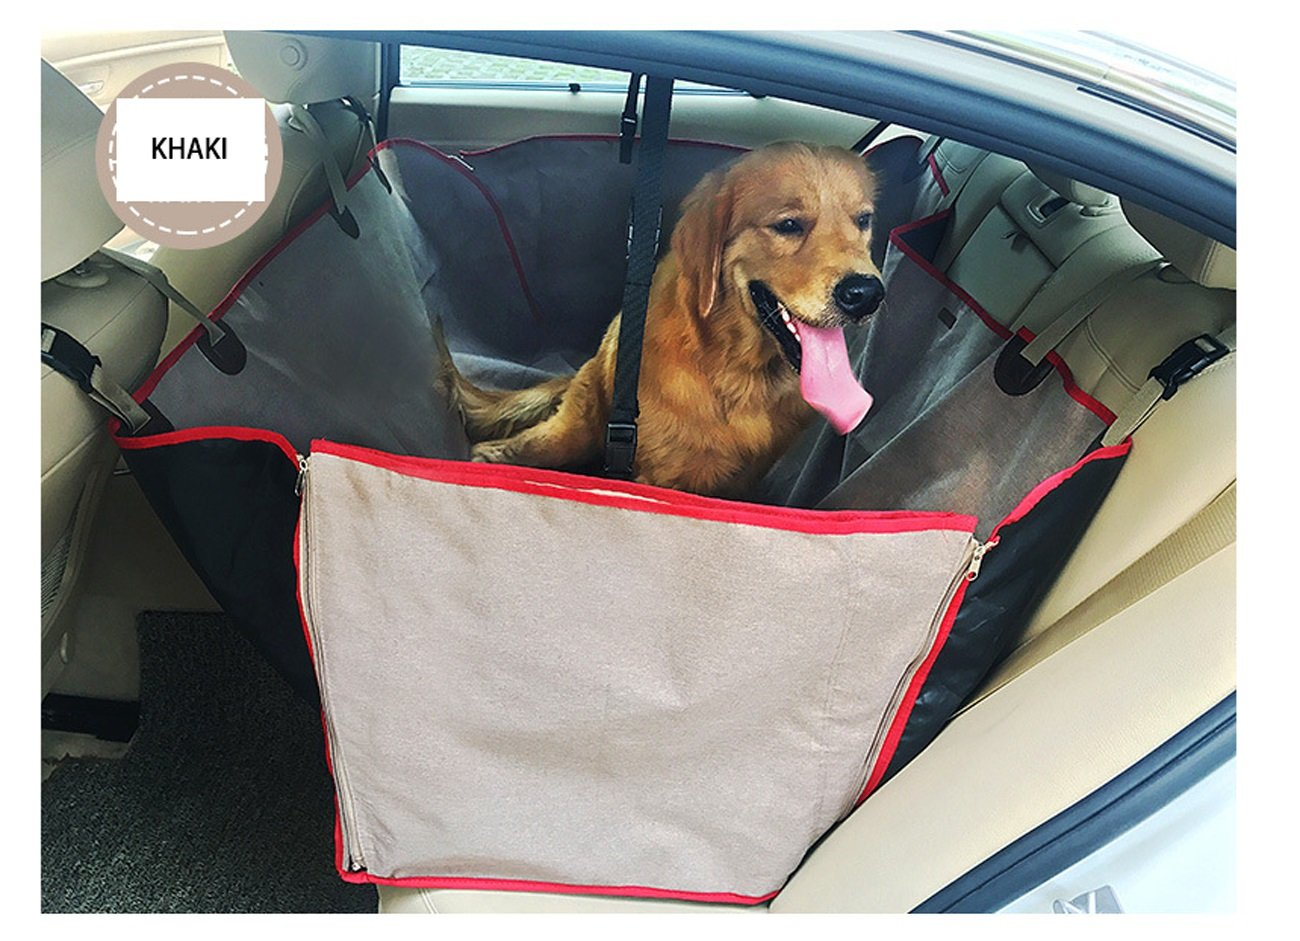 Khaki Black Manba Car Bench Seat Cover Hammock Luxury Water Resistence Car Seat Cover For Medium & Large Dogs Pet (color   Khaki)